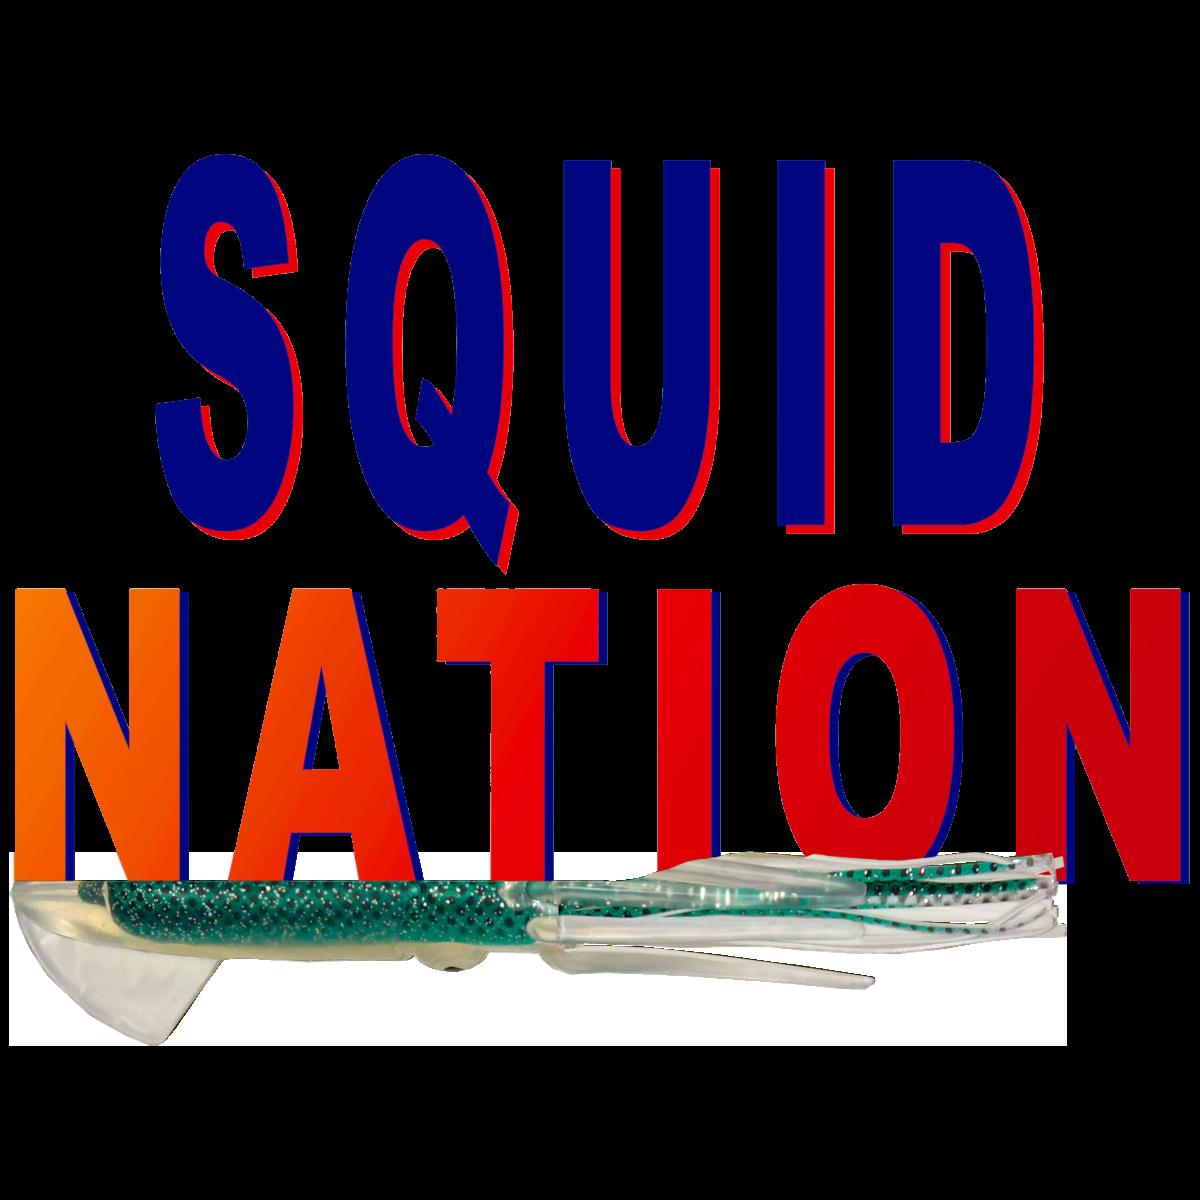 Squidnation